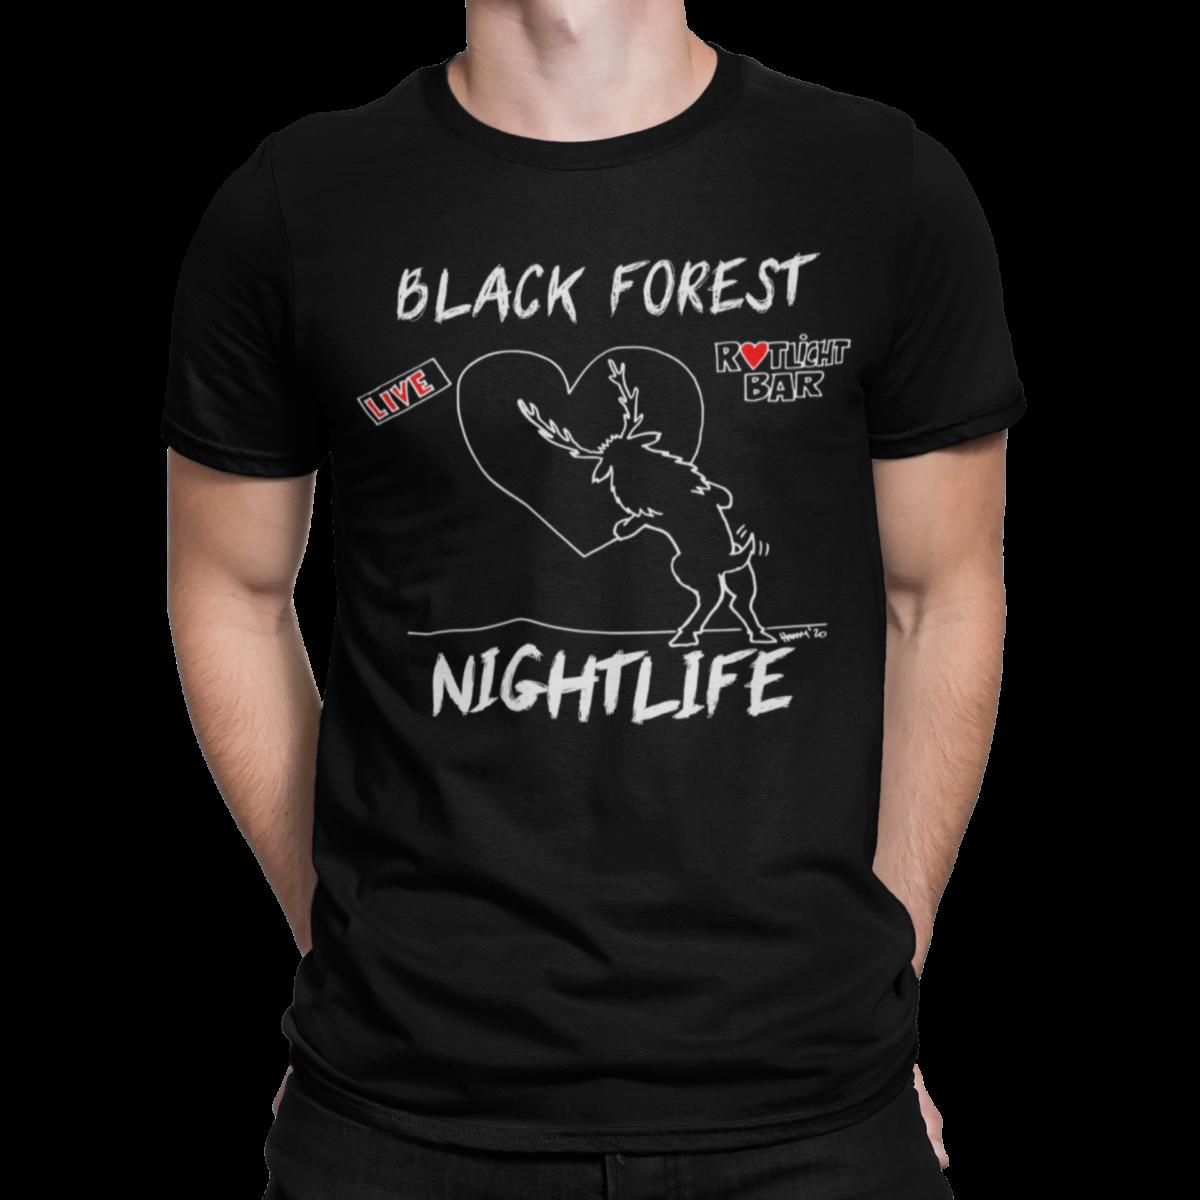 schwarzwald männer t-shirt - Black-Forest-Nightlife